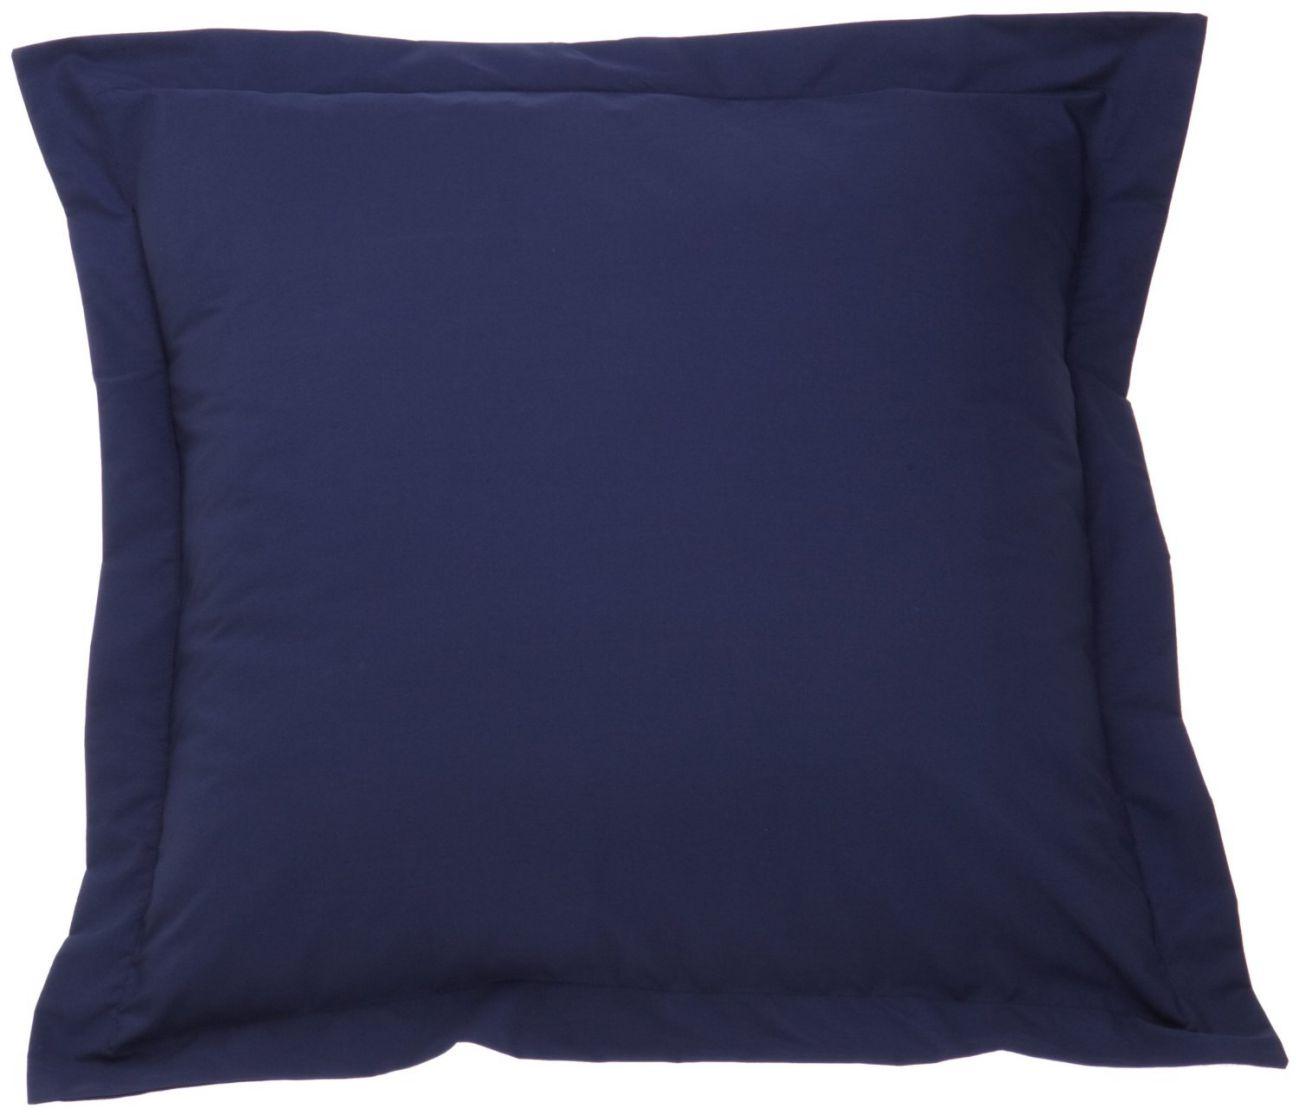 Fresh Ideas Tailored Poplin Pillow Sham Euro, Navy